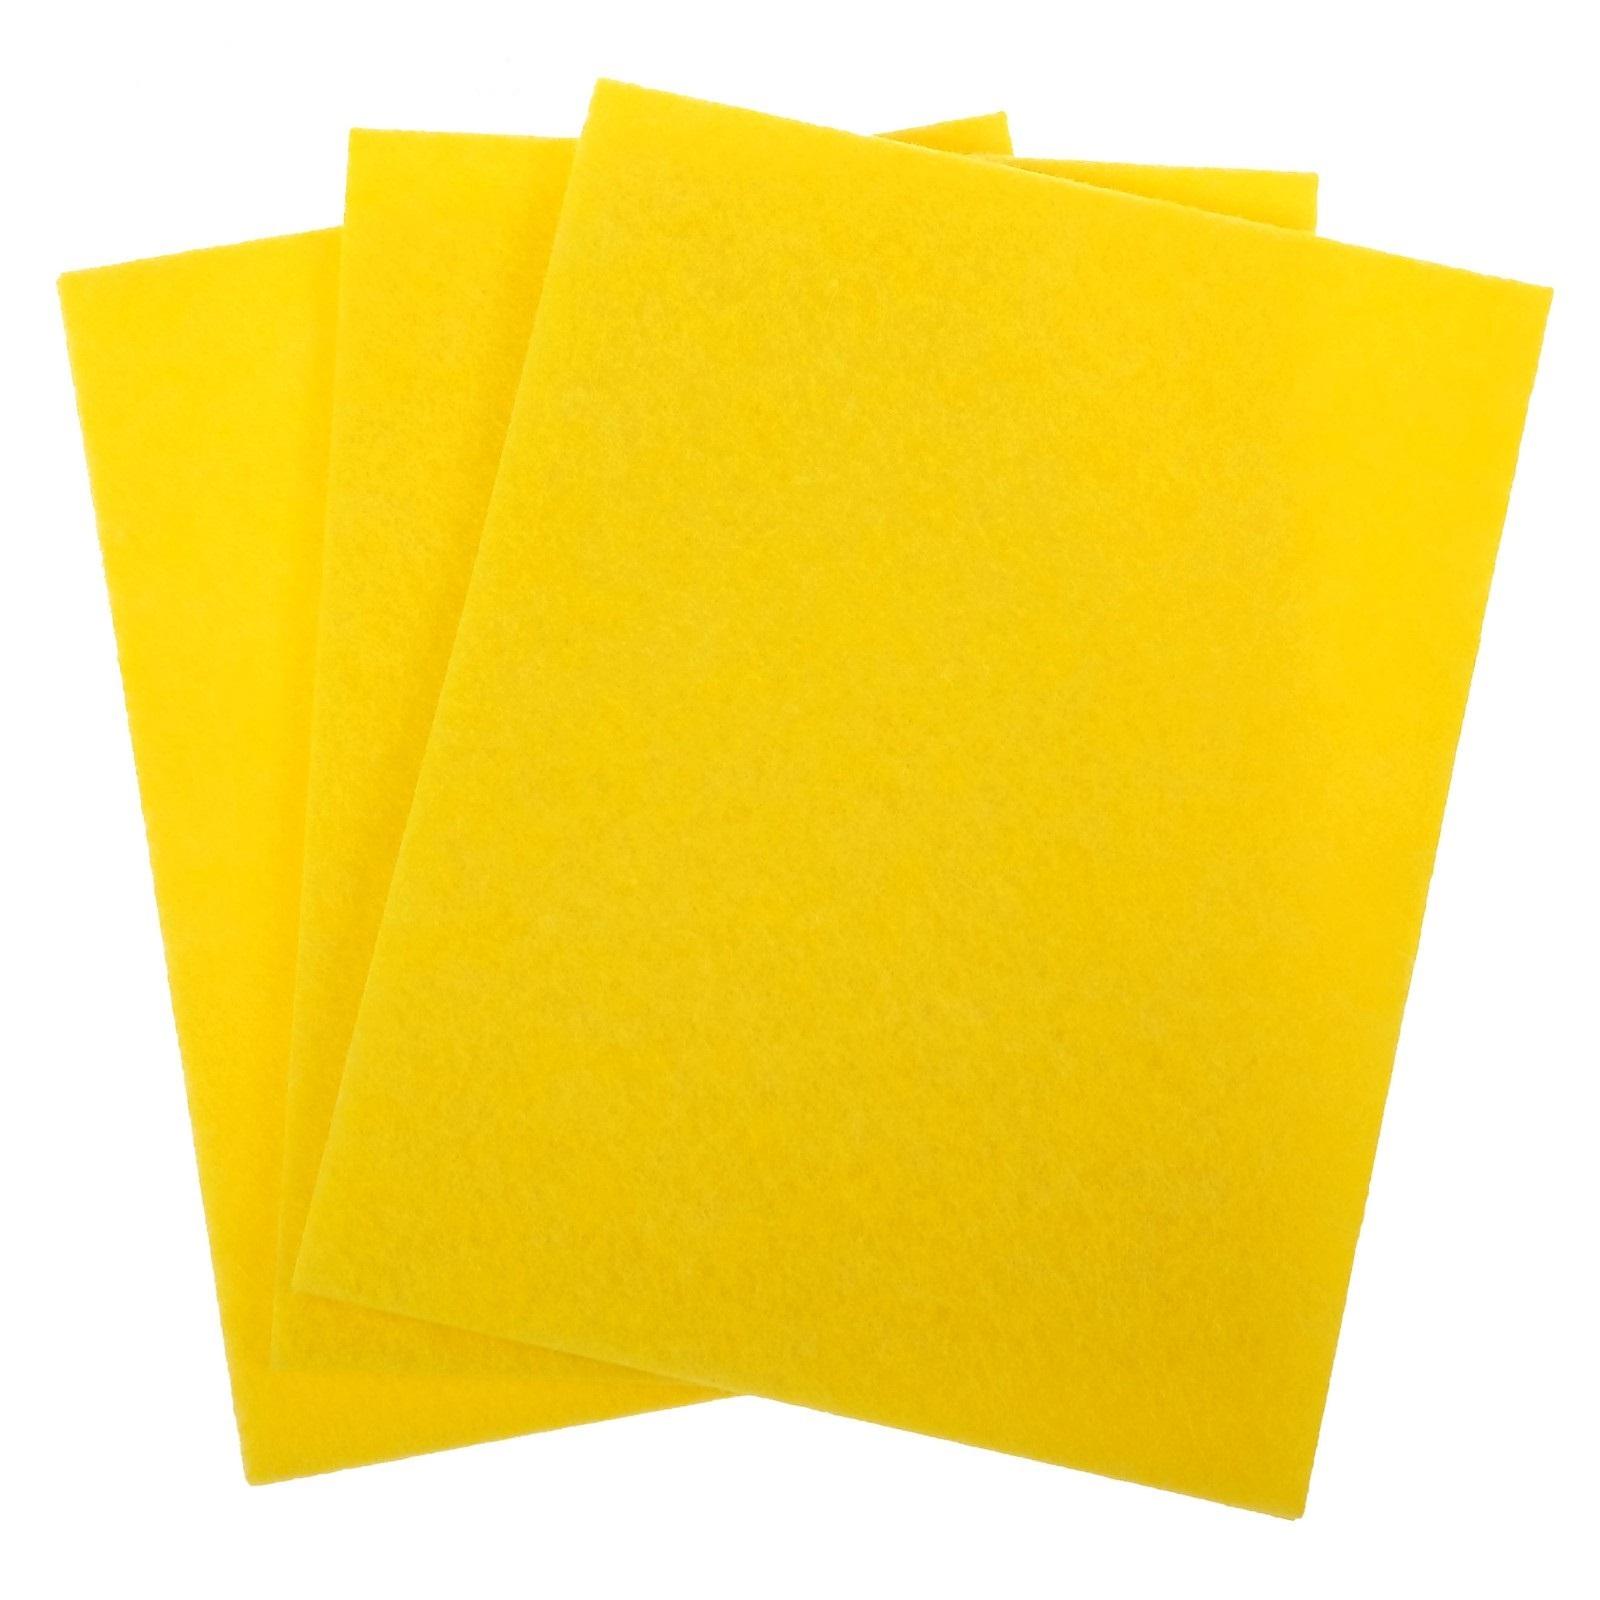 "Салфетка TEXTOP ""Standart"" 30х35см, вискоза, желтая, 3шт/уп - изображение 1"